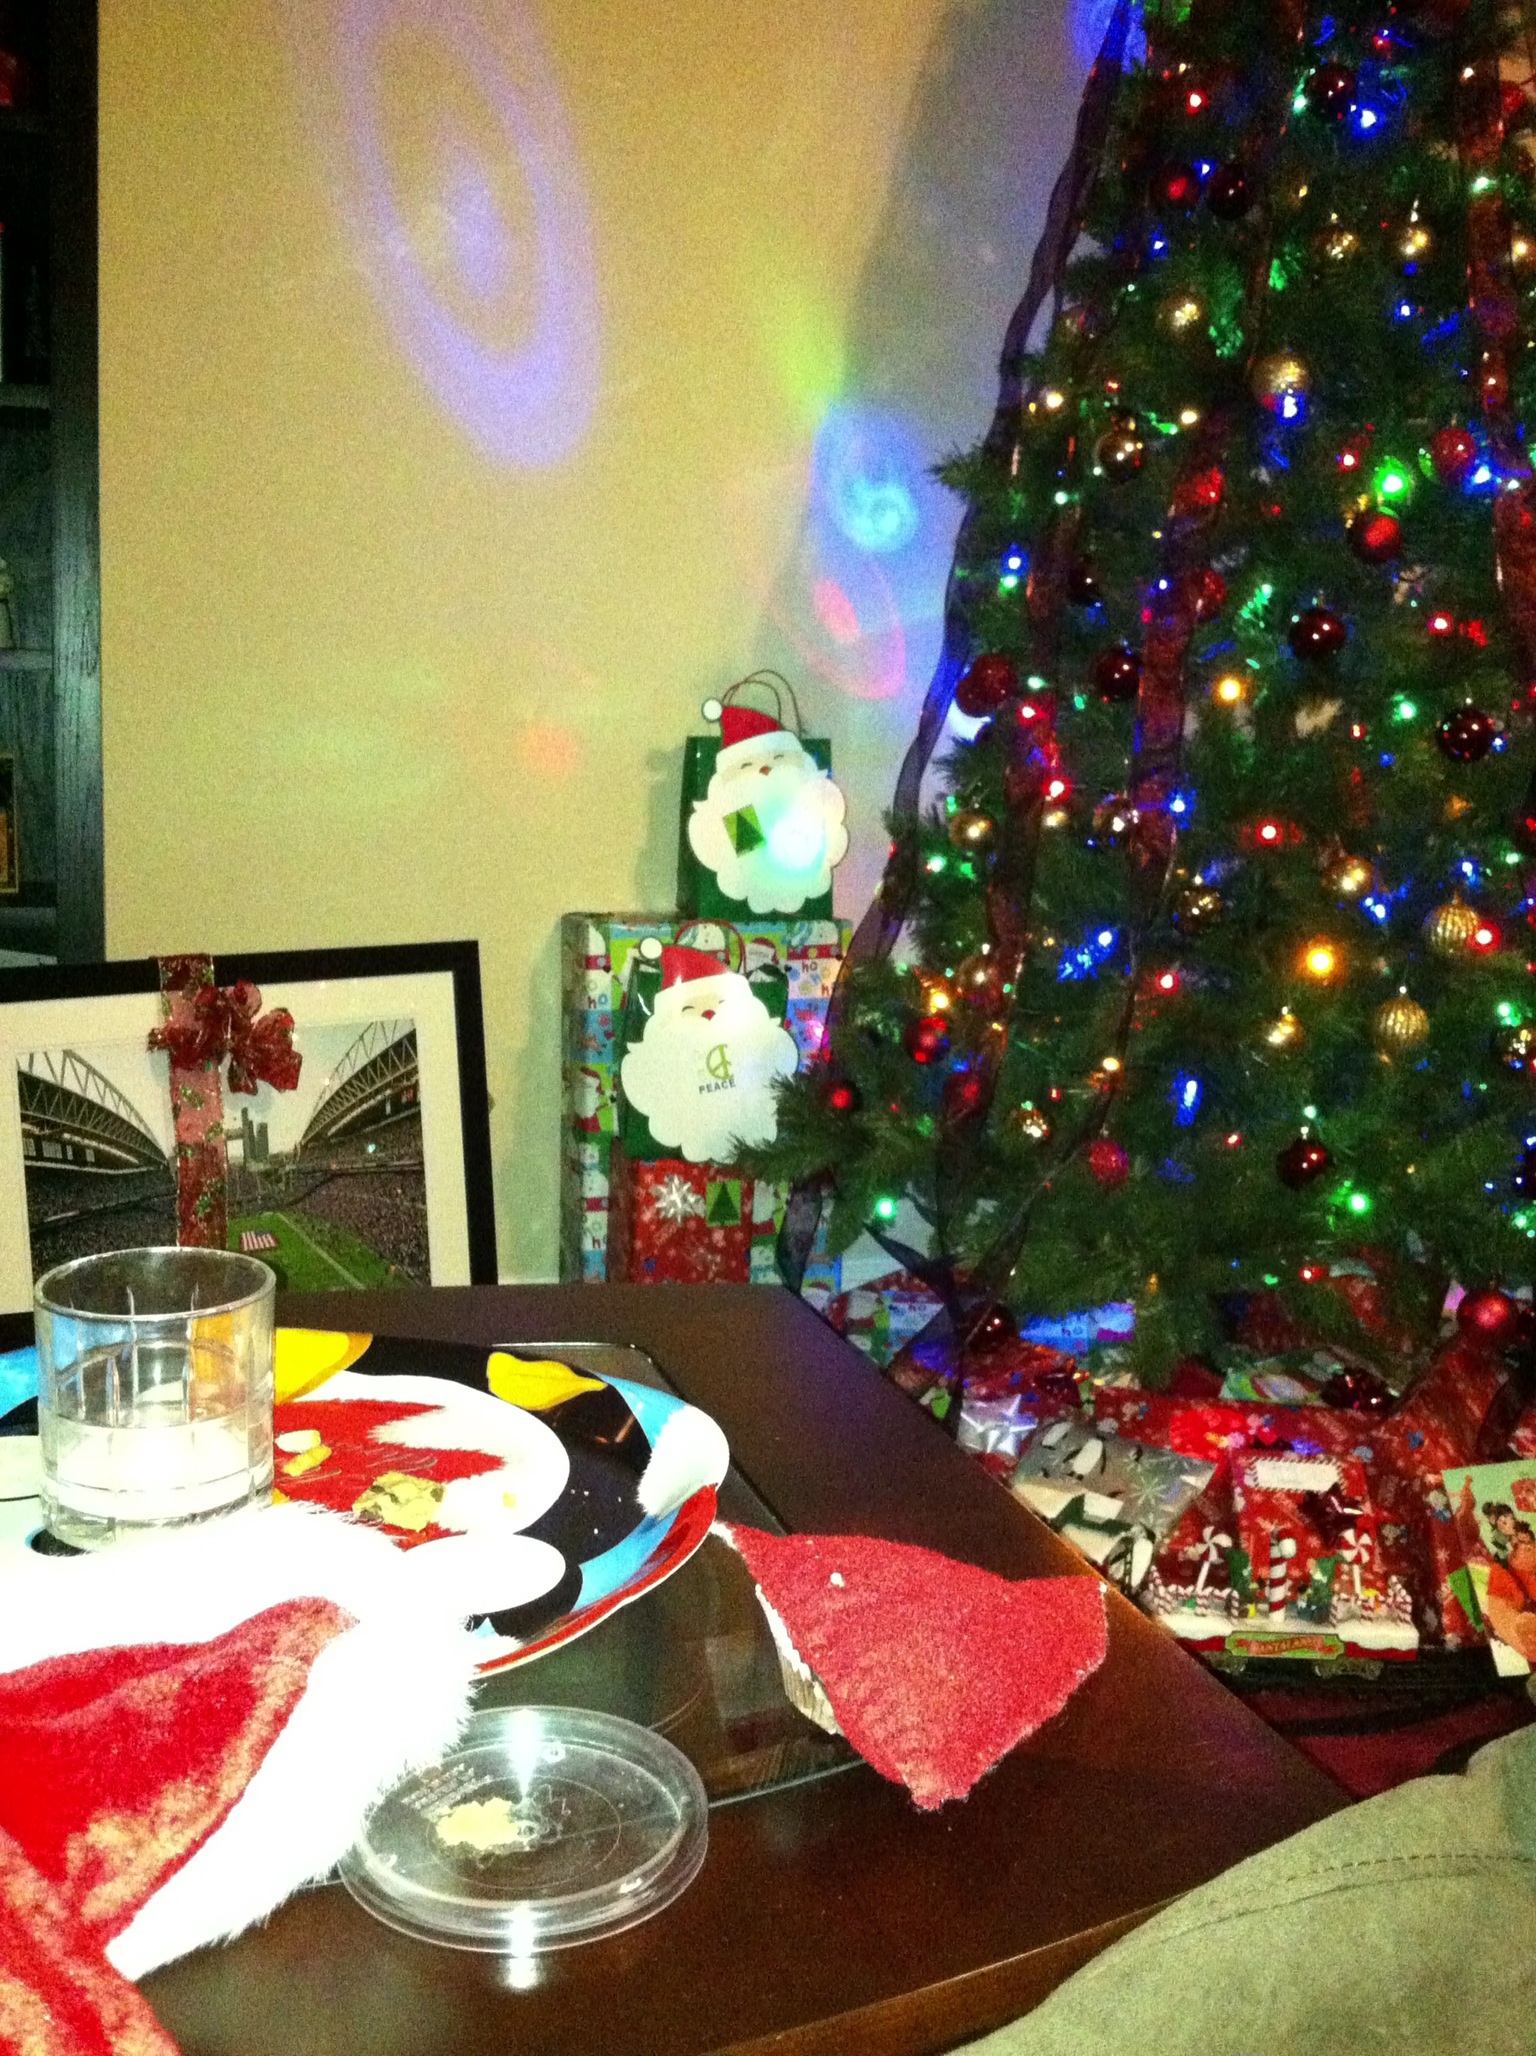 Merry Christmas, ya'll!!